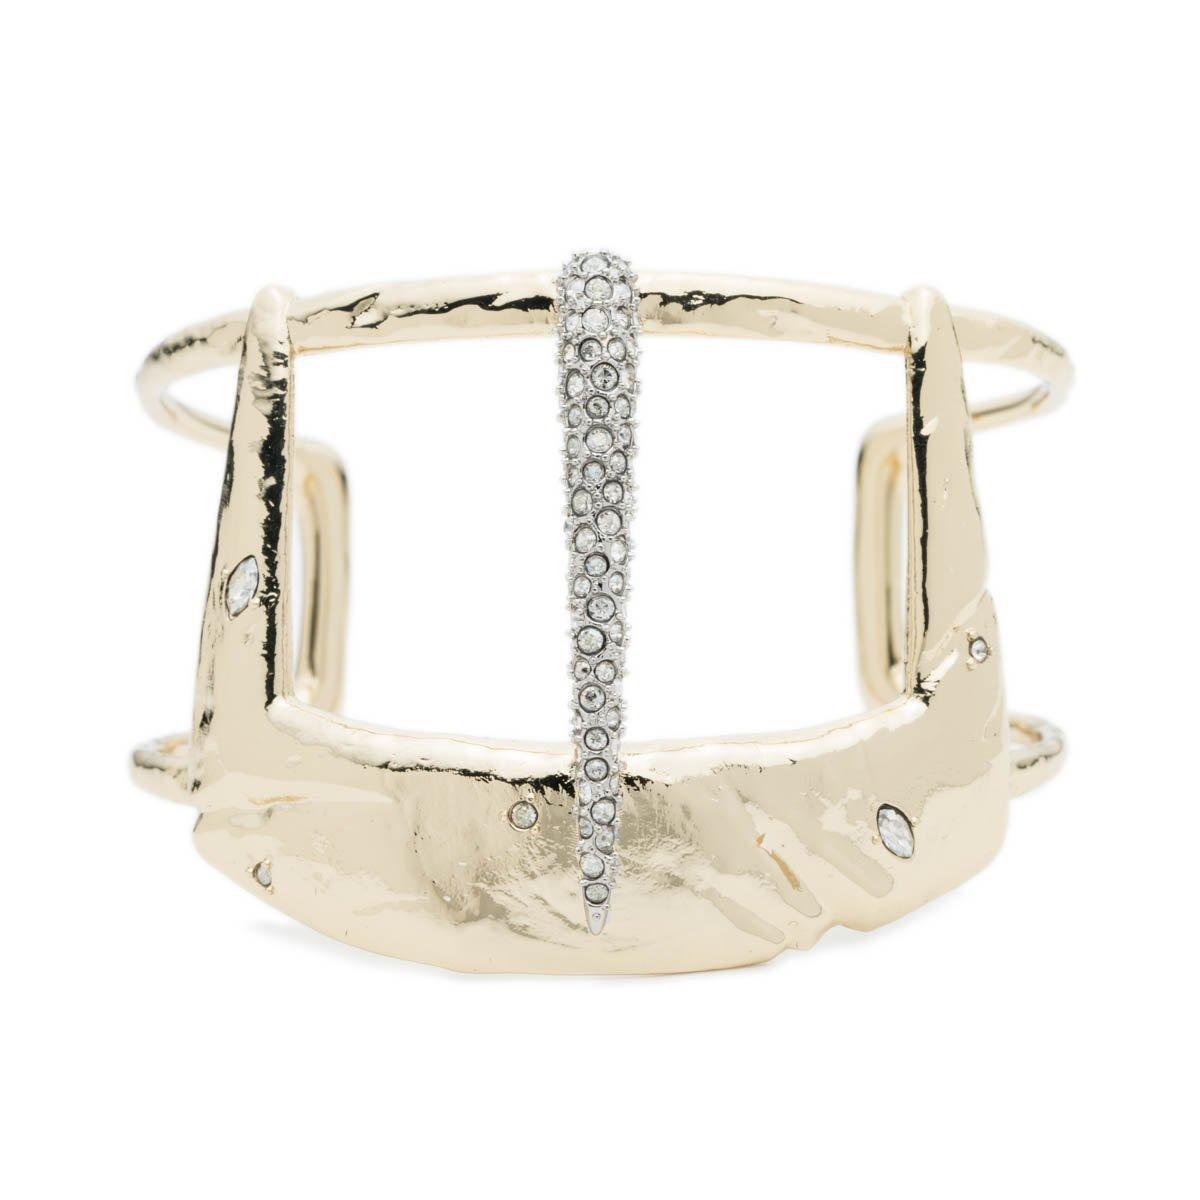 Alexis Bittar Fall 2017 Wide Buckle Cuff Bracelet